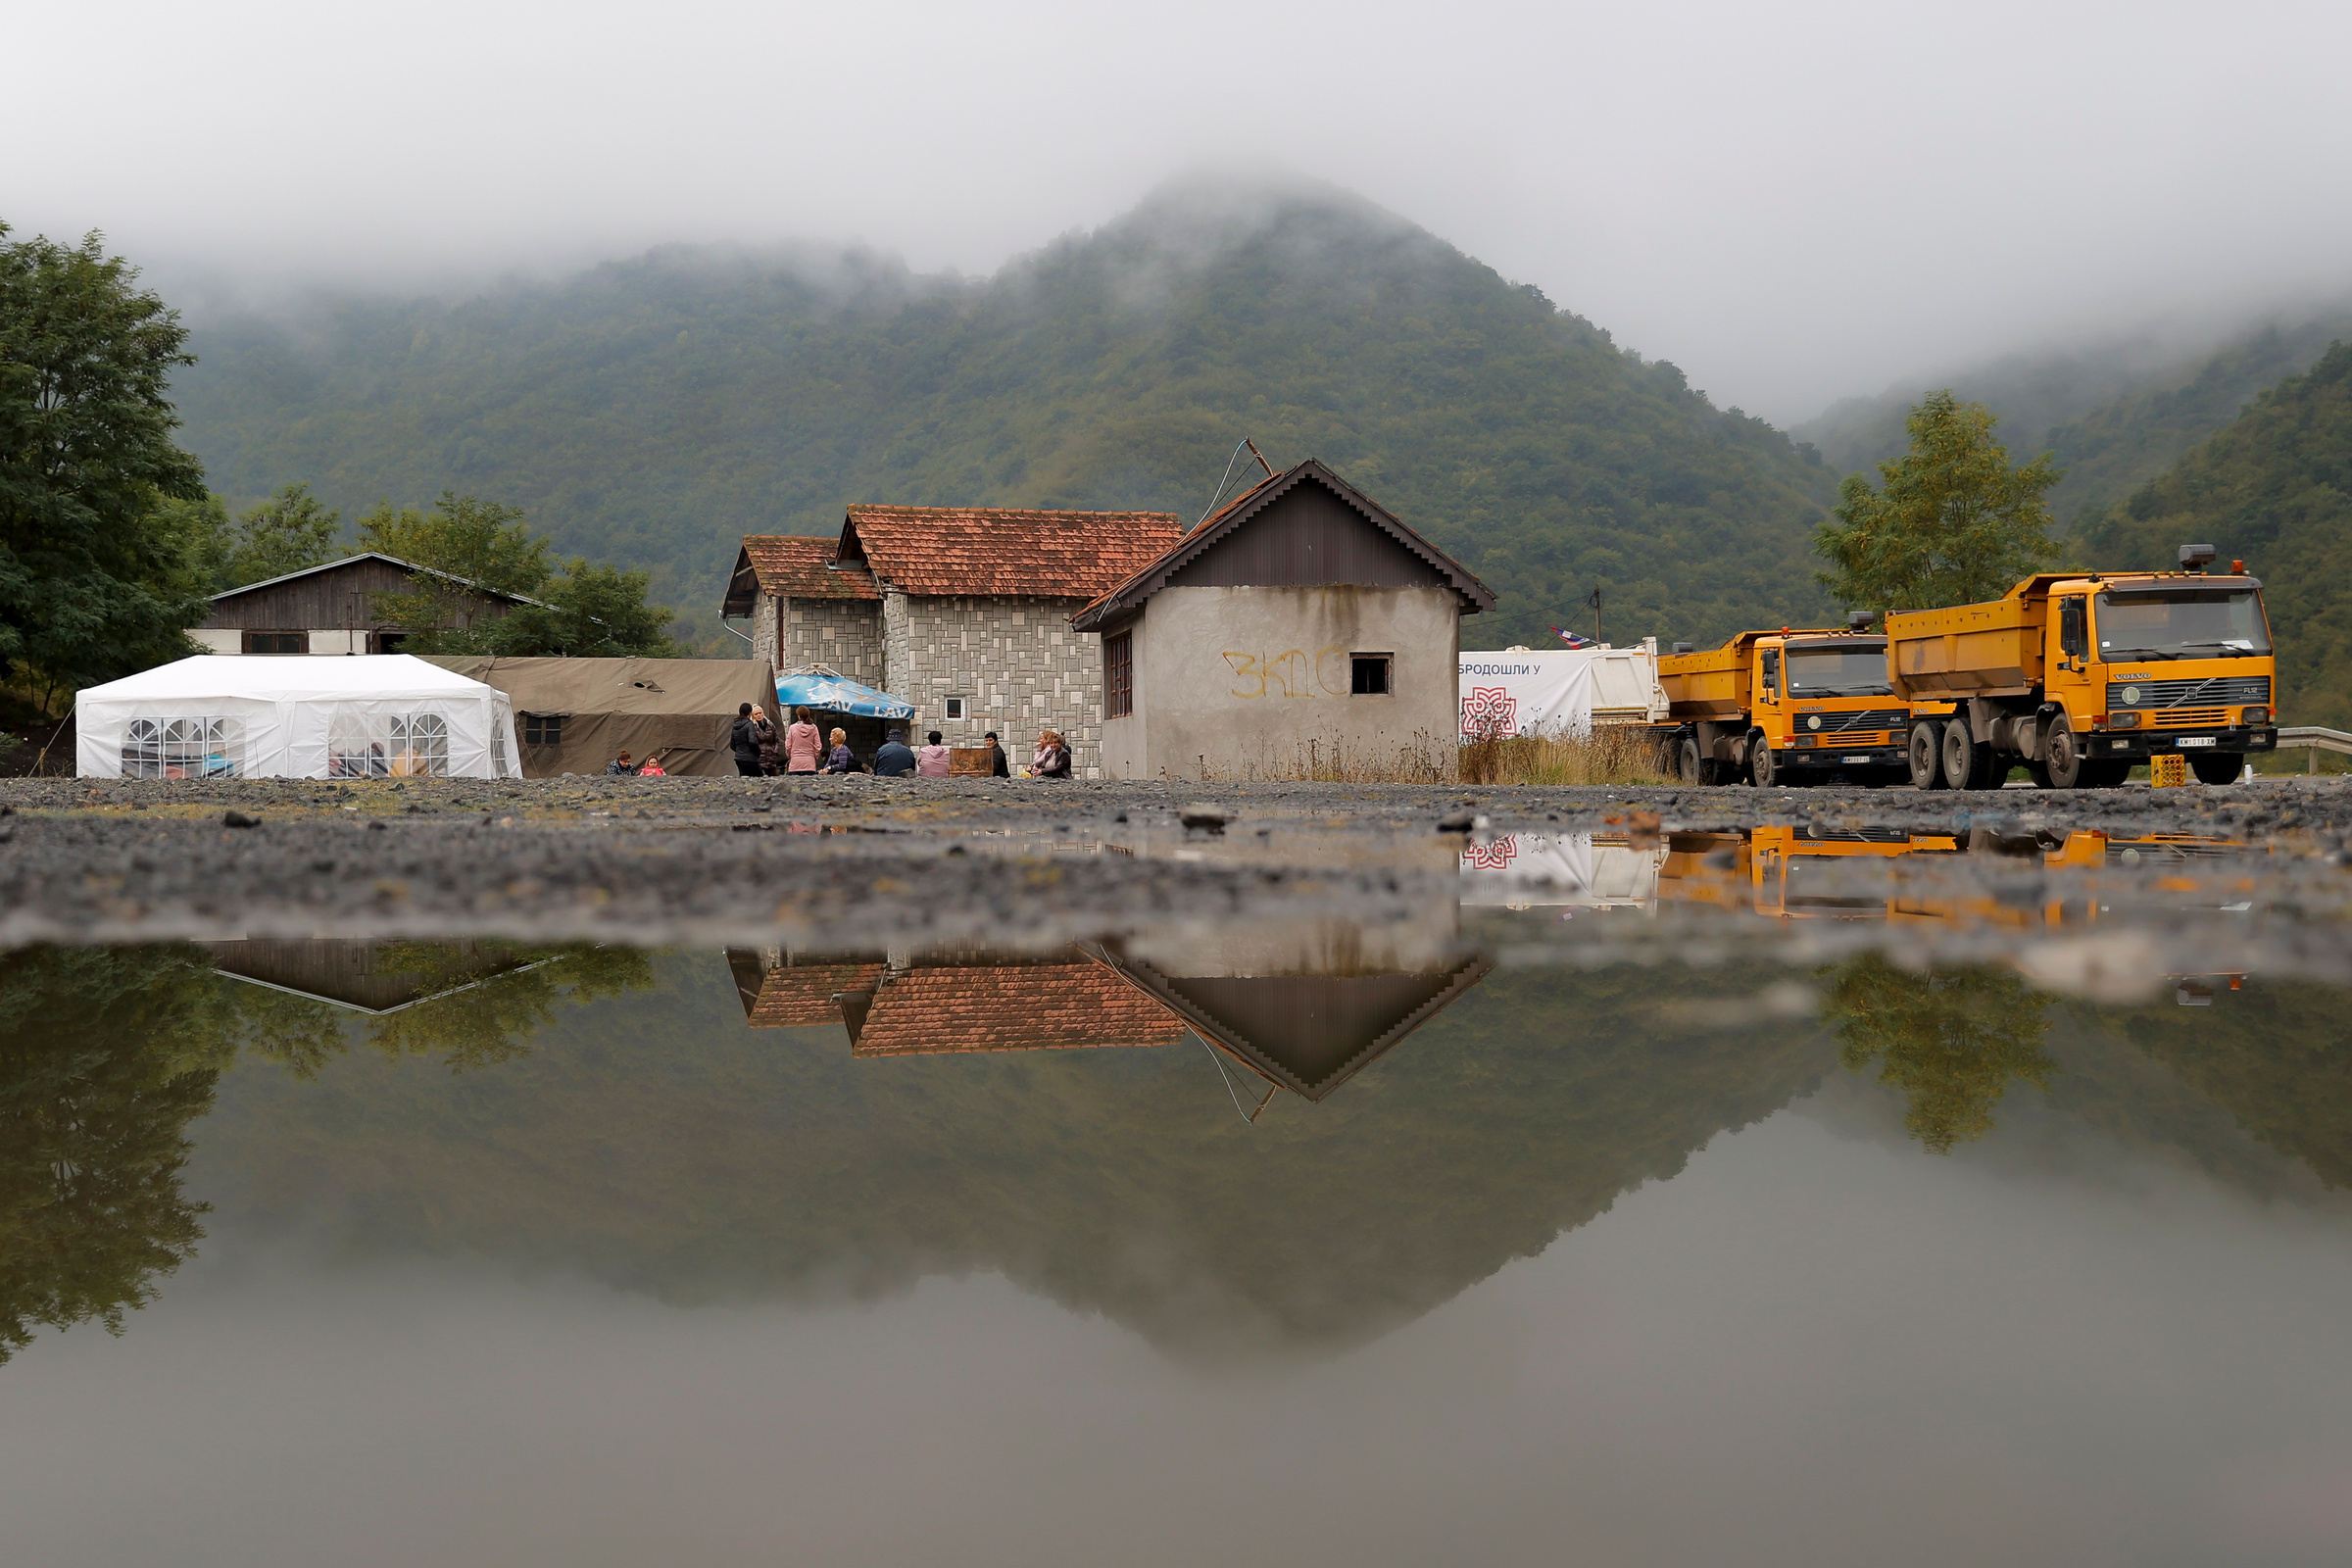 Ситуация вблизи КПП Ярине на границе Сербии и Косова. Фото © ТАСС / EPA / VALDRIN XHEMAJ